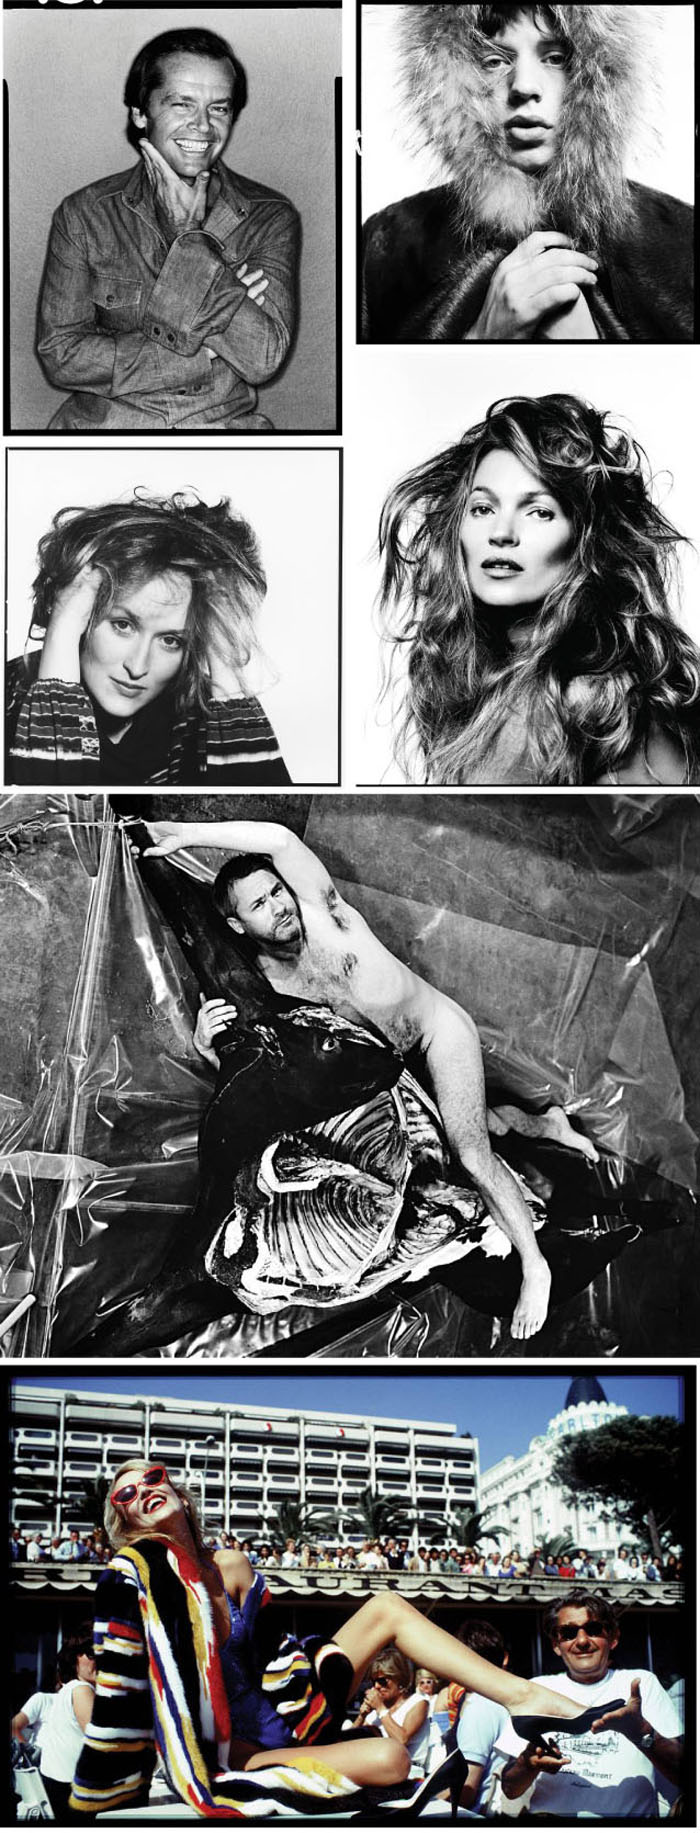 Jack Nicholson, 1978, Mick Jagger, 1964; Meryl Streep, 1980; Kate Moss, 2013; Damien Hirst, 2013; Jerry Hall with Helmut Newton, 1983.